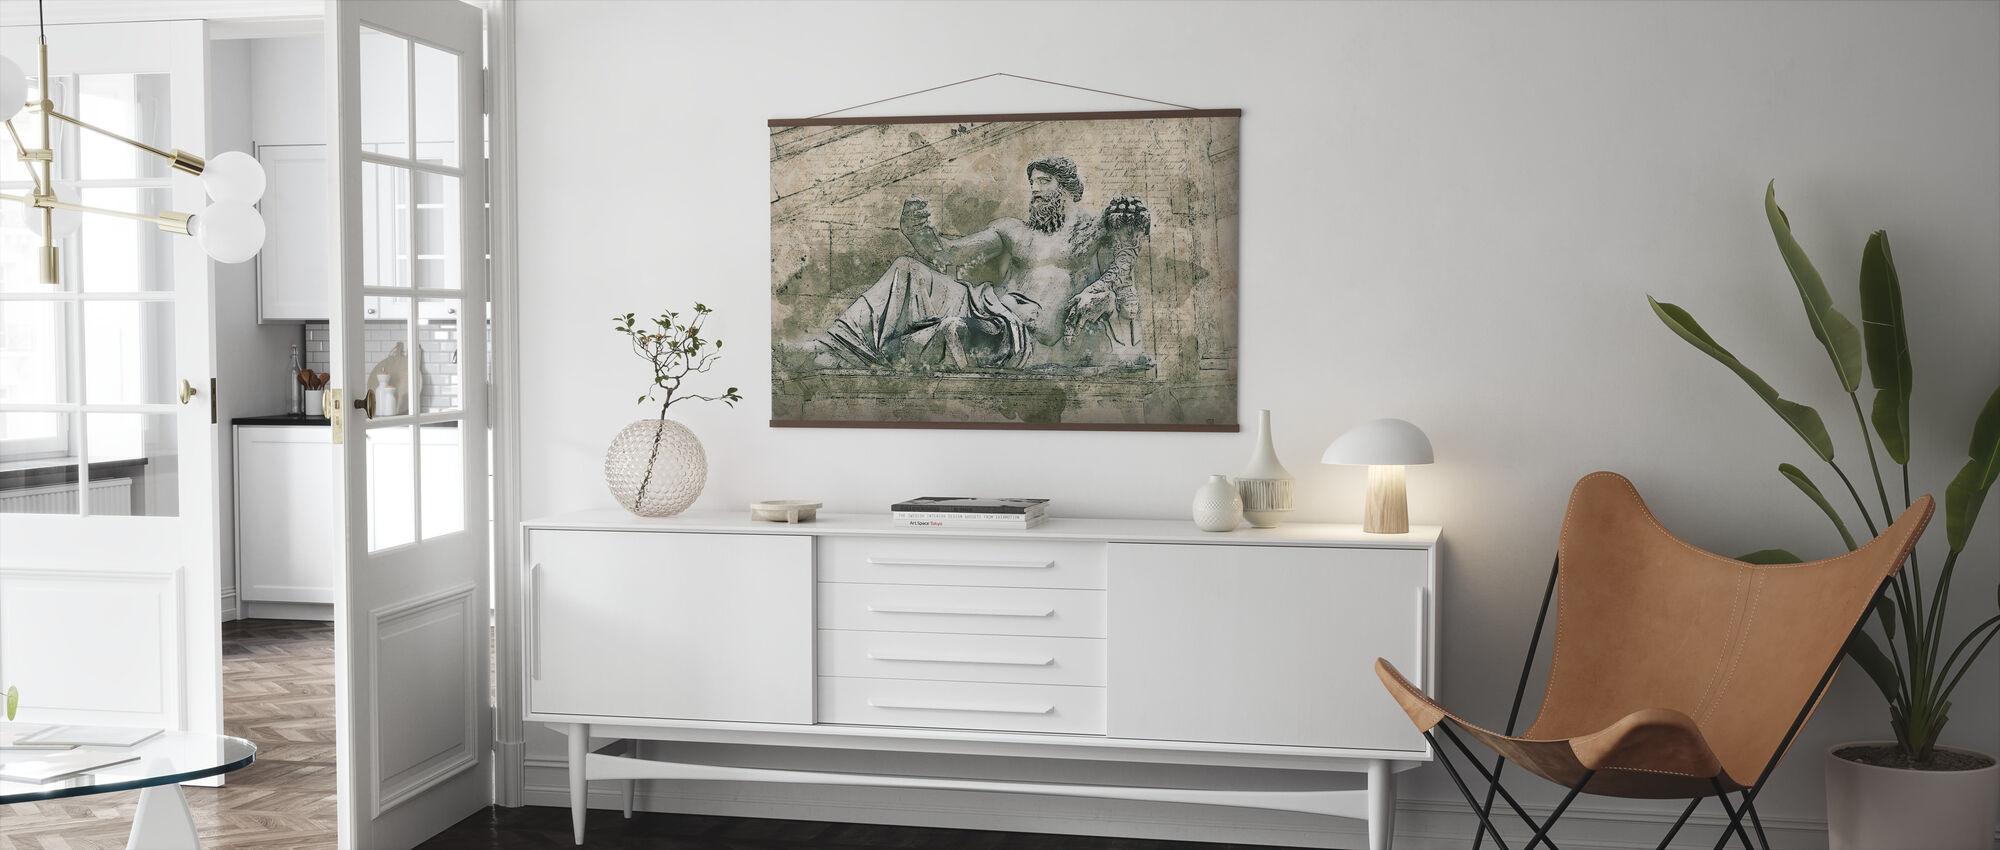 Rome Vintage Statue - Poster - Living Room